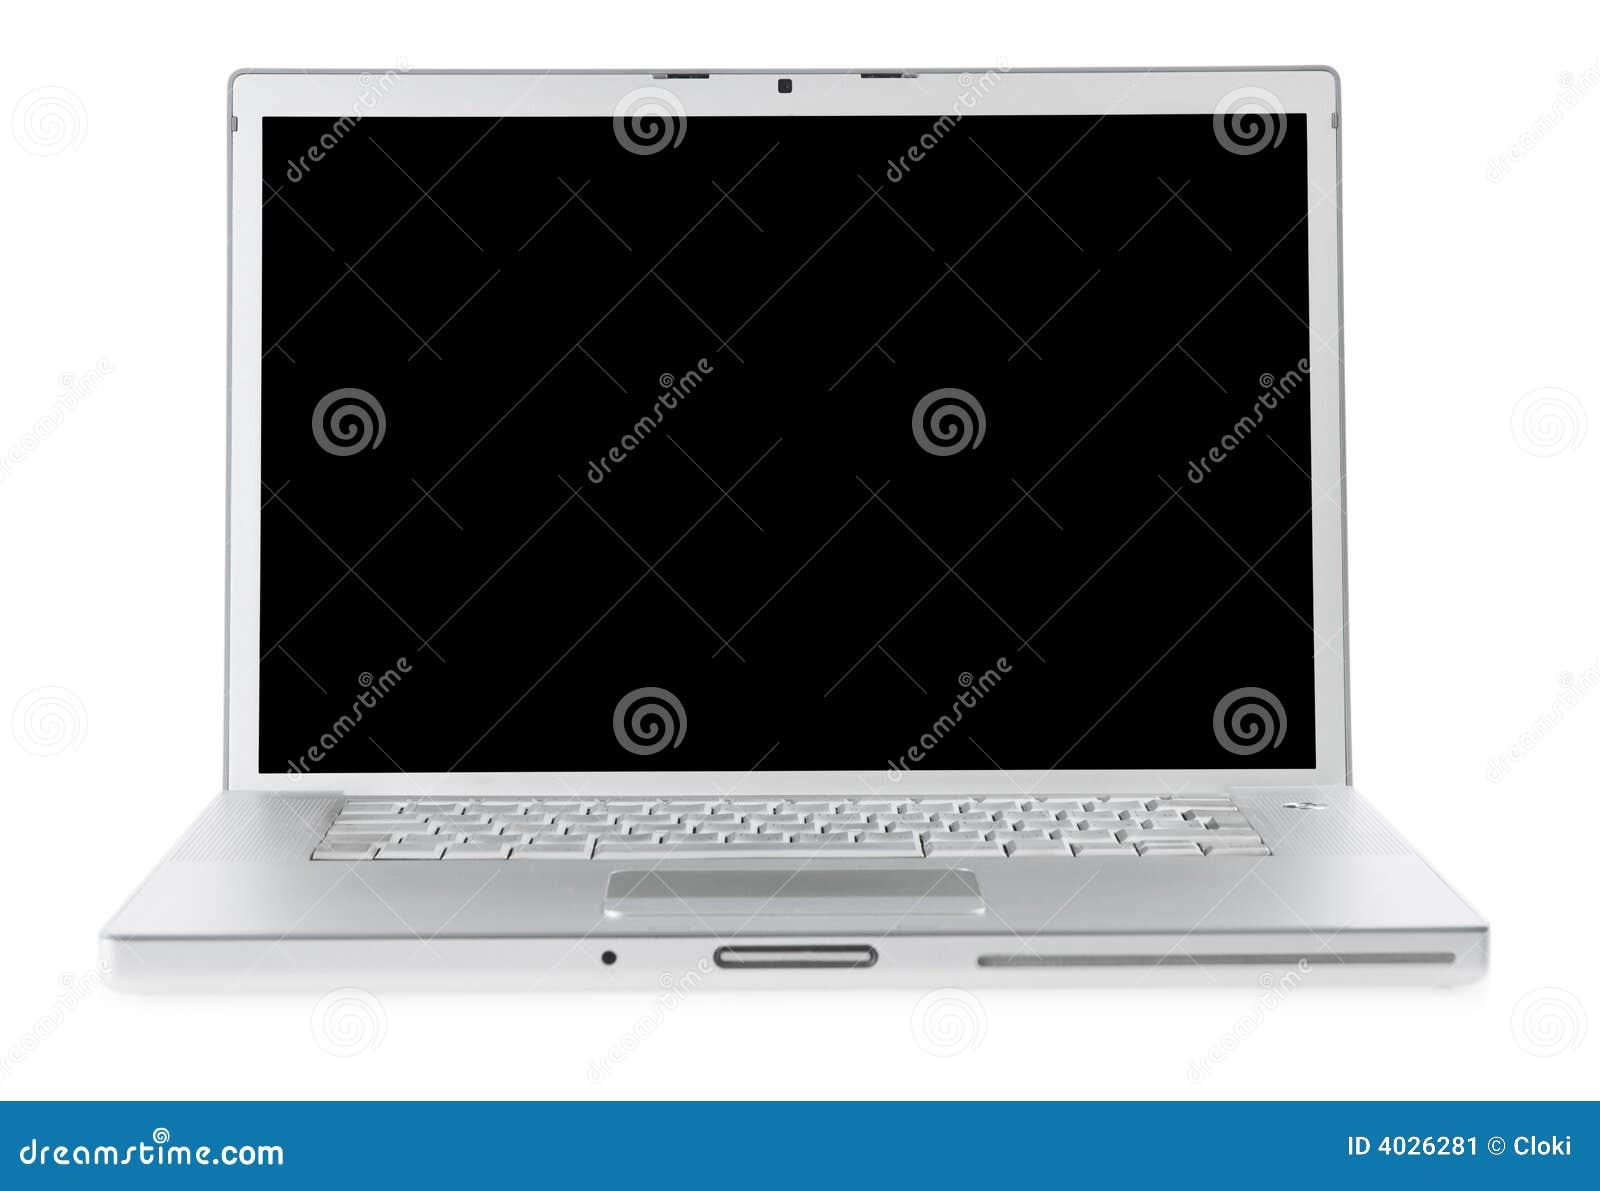 Laptop isolated on white.